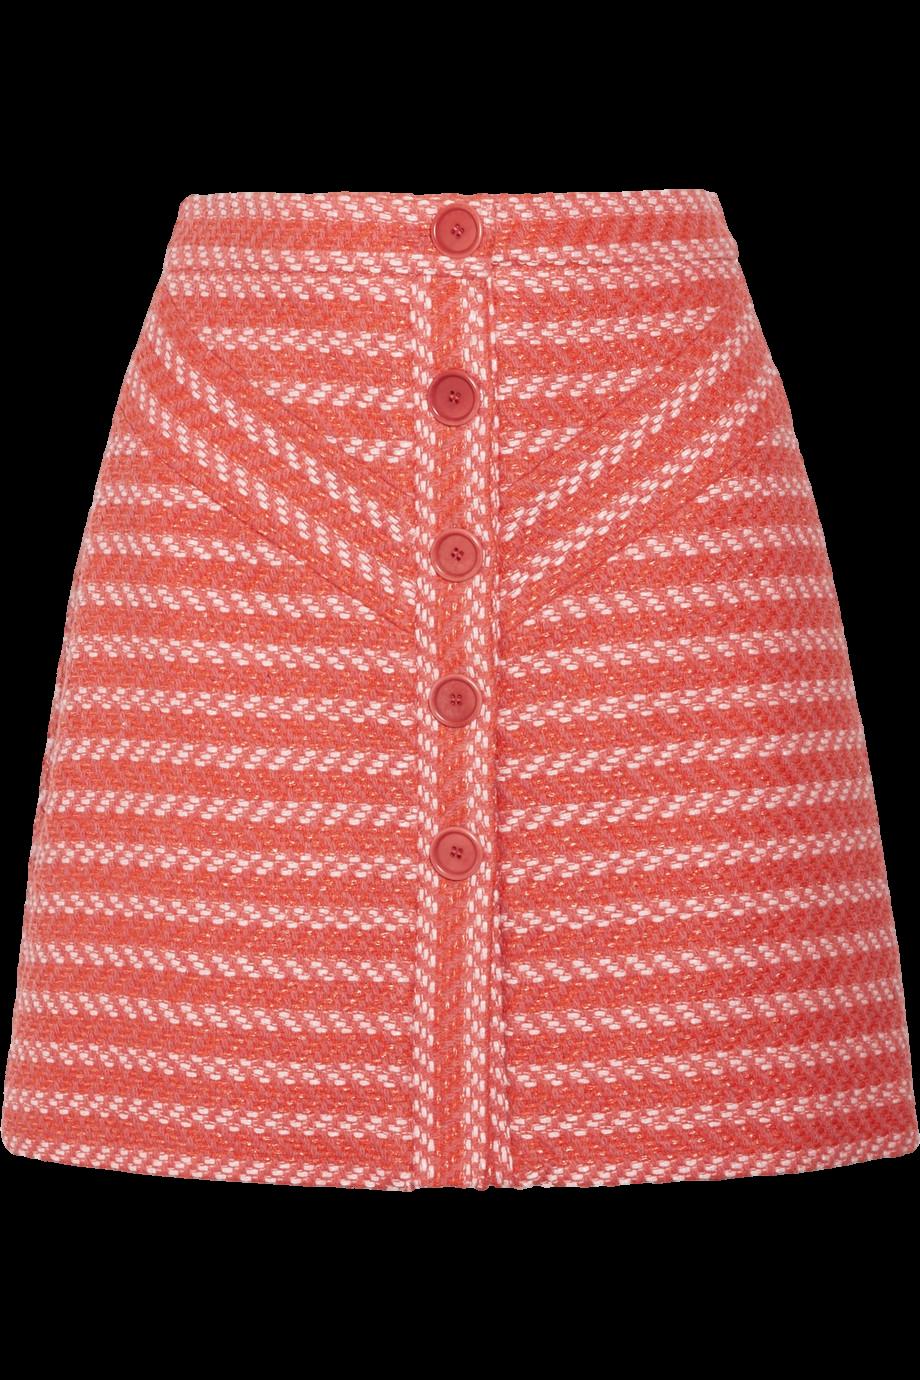 https-__www.theoutnet.com_en-US_Shop_Product_Maje_Jalil-tweed-mini-skirt_909205_clipped_rev_1.png